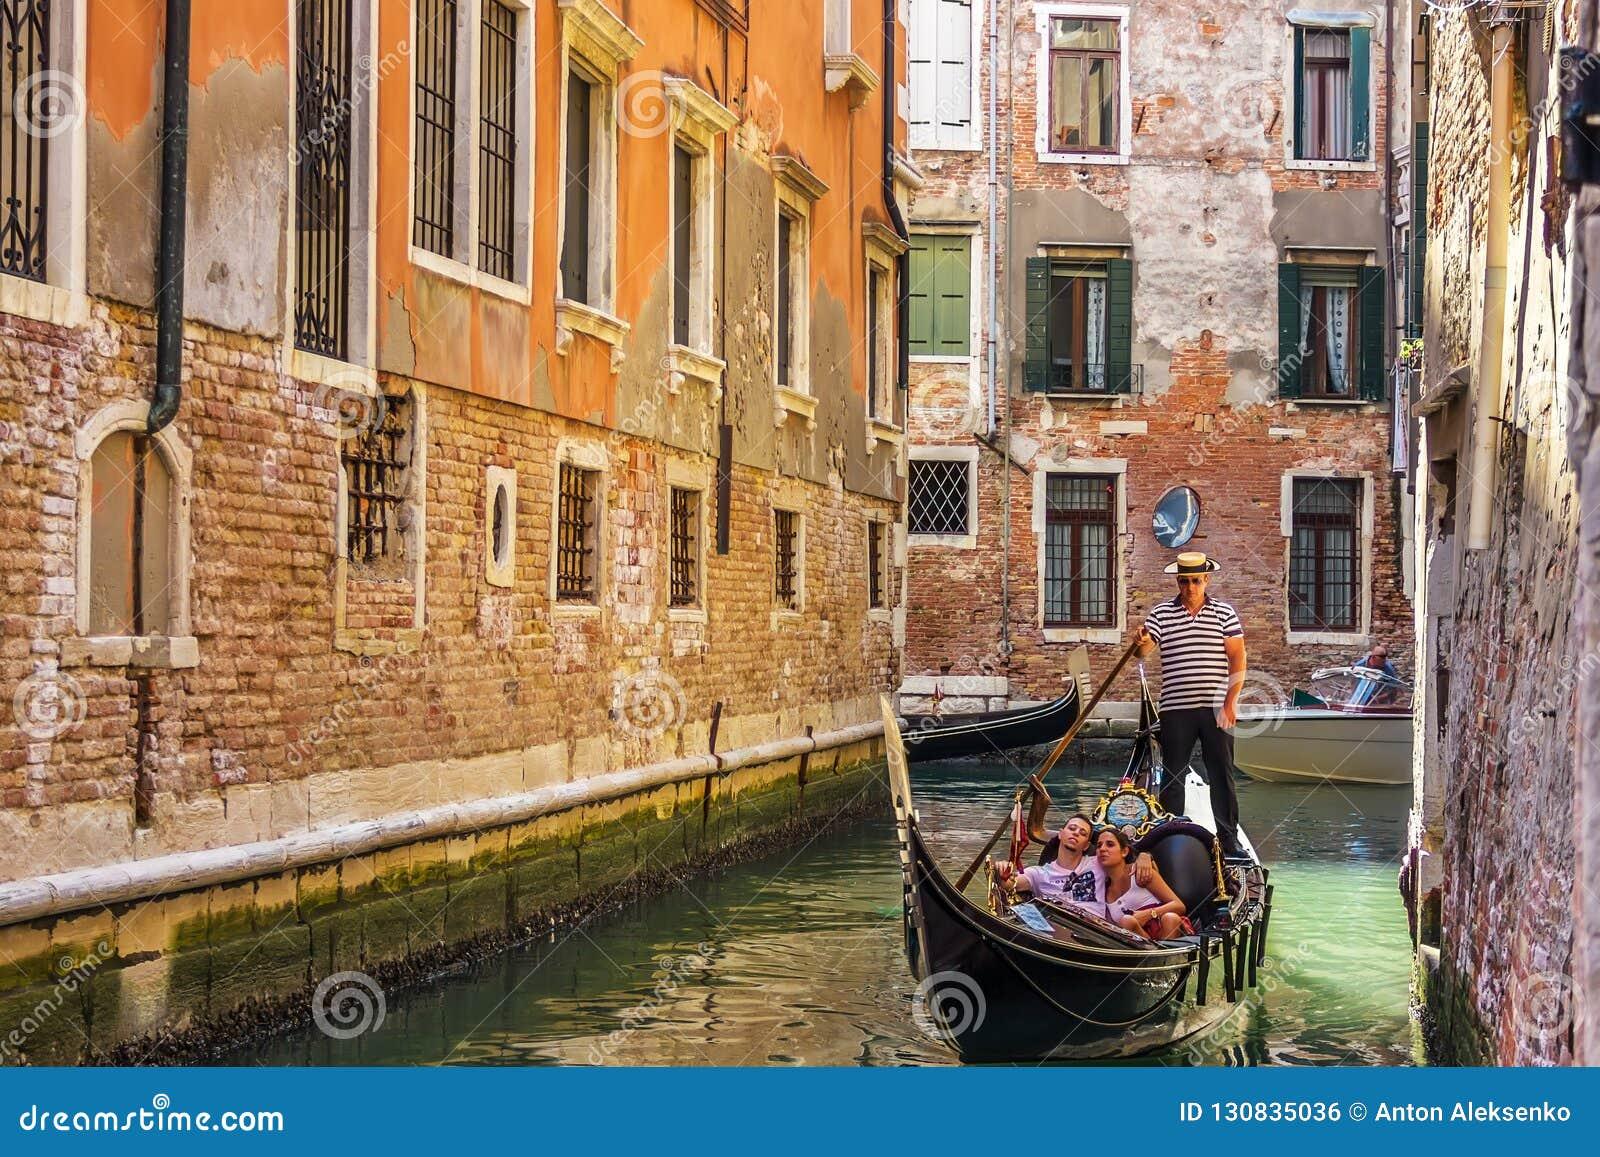 Венеция, Италия - 22-ое августа 2018: Гондола управляла gondolier в канале узкой улочки Венеции